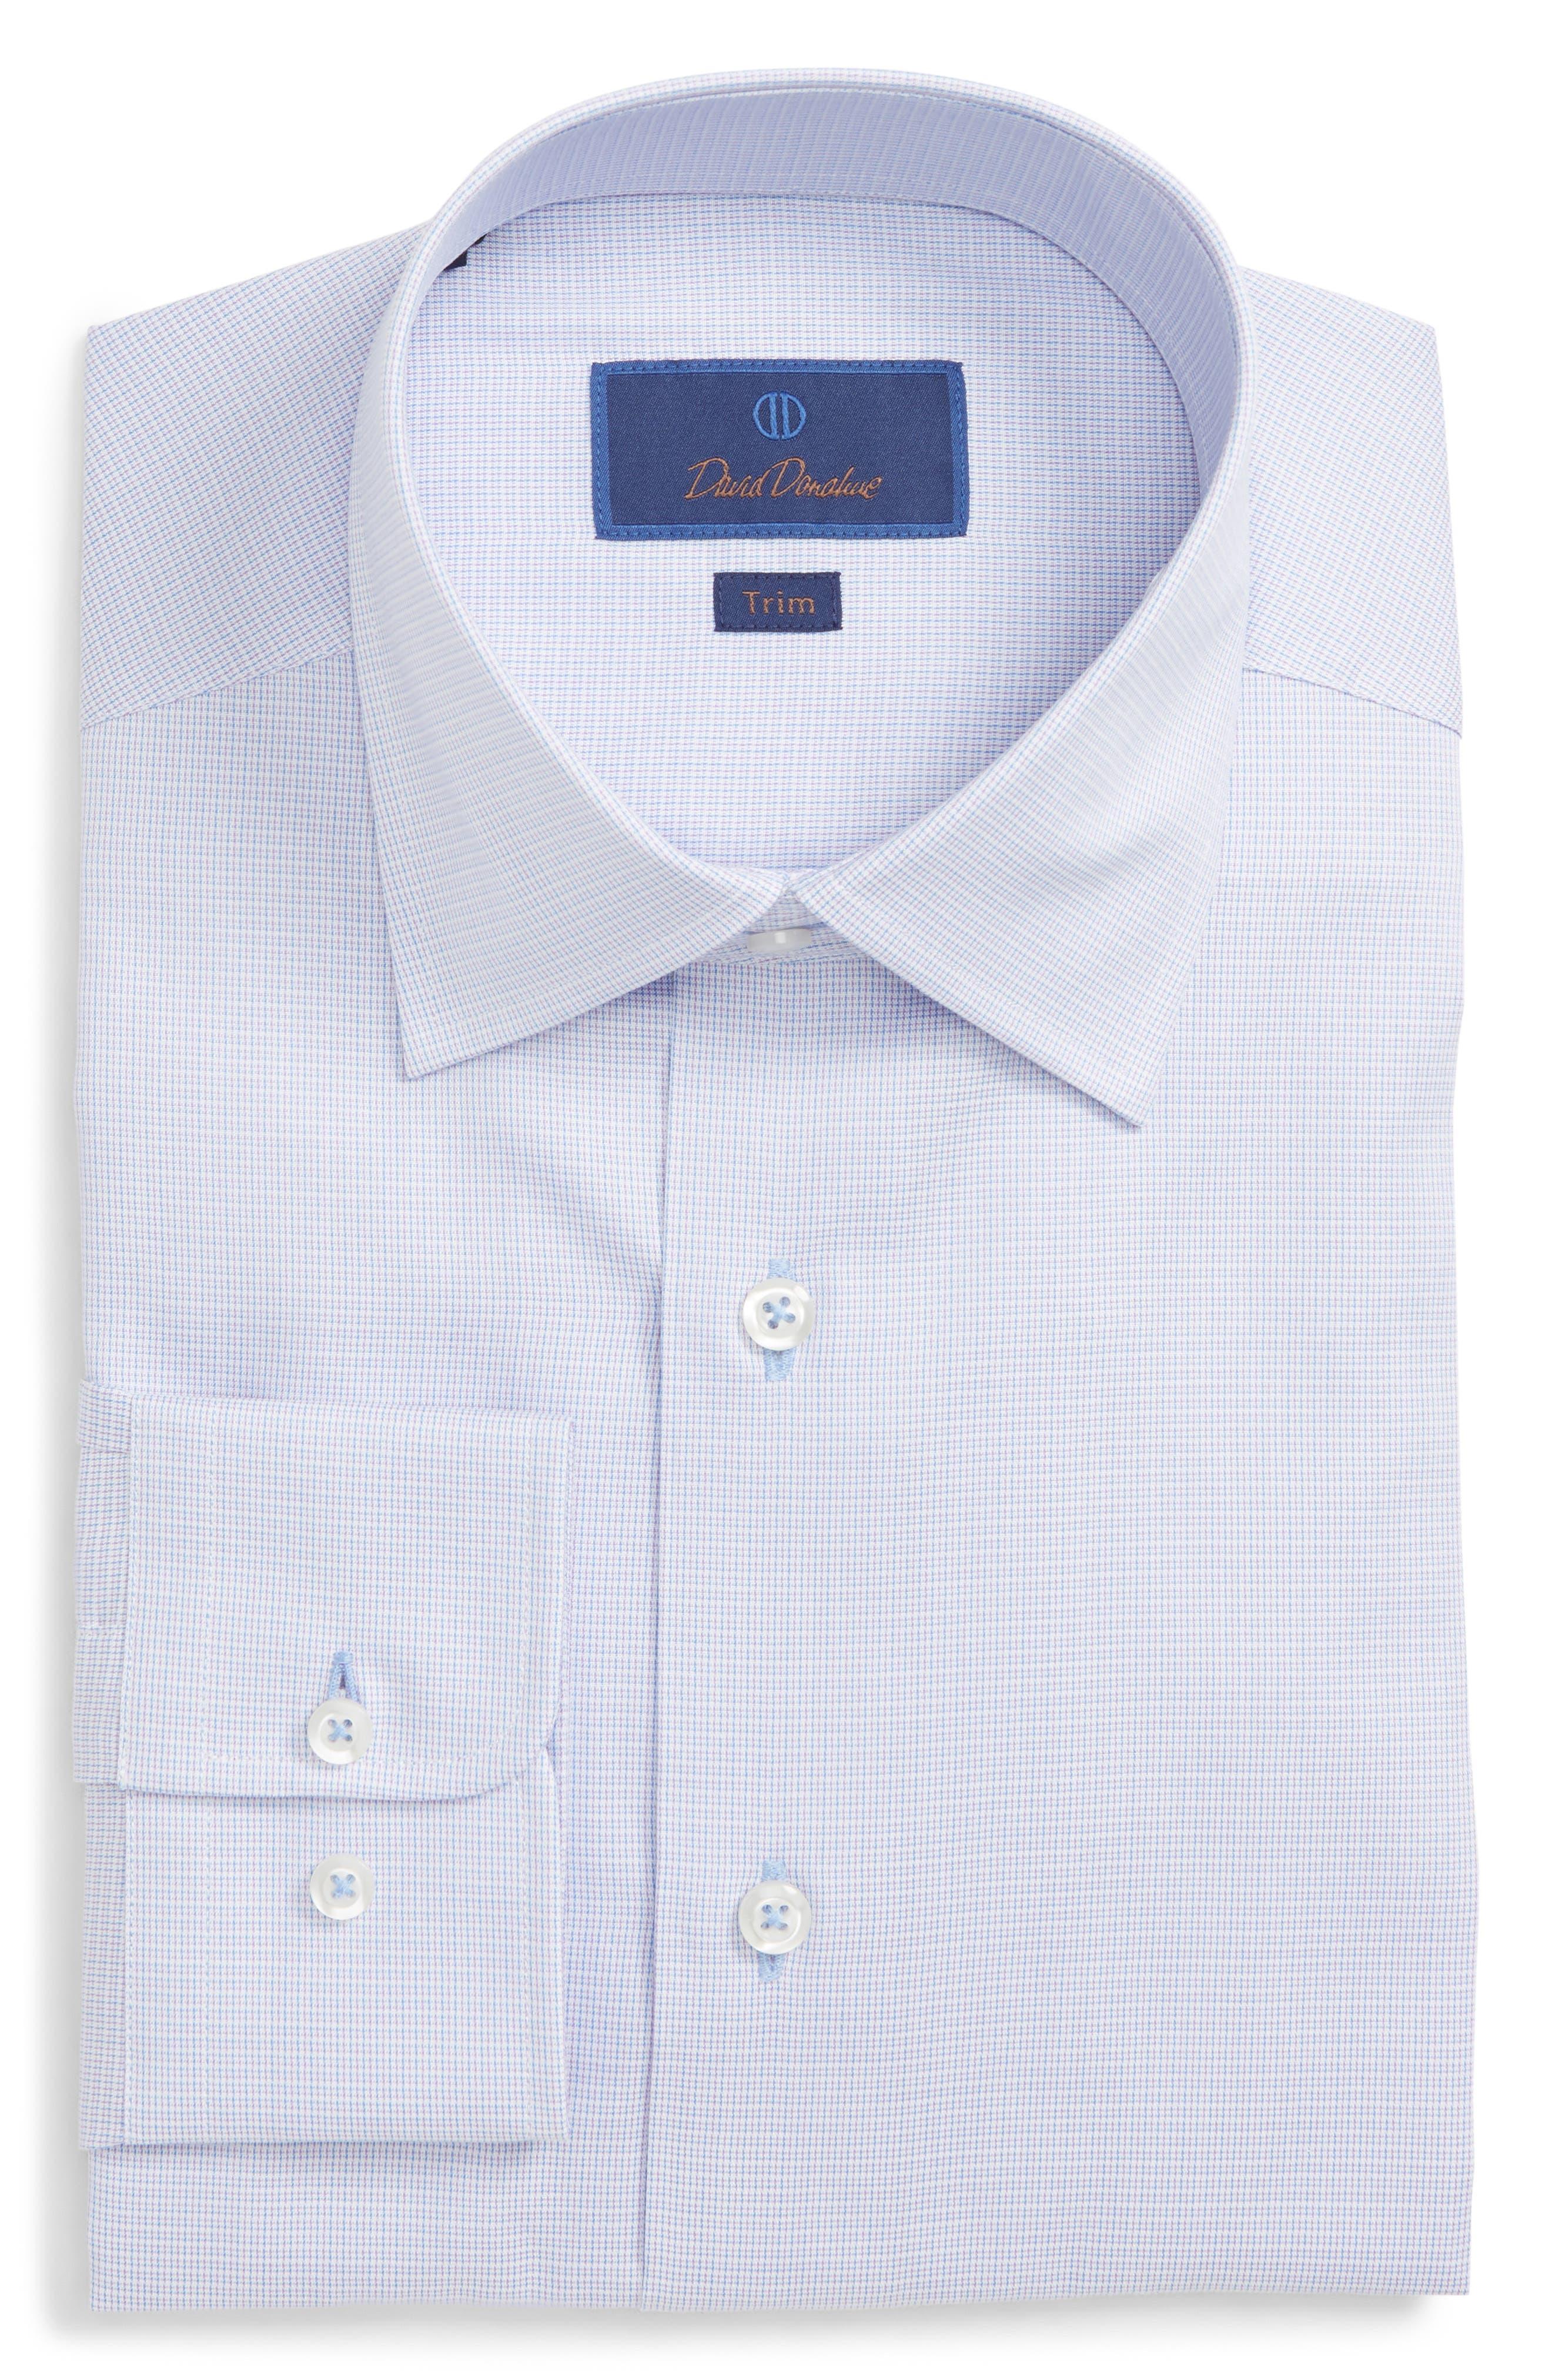 DAVID DONAHUE Men'S Trim-Fit Mini Check Dress Shirt in Lilac